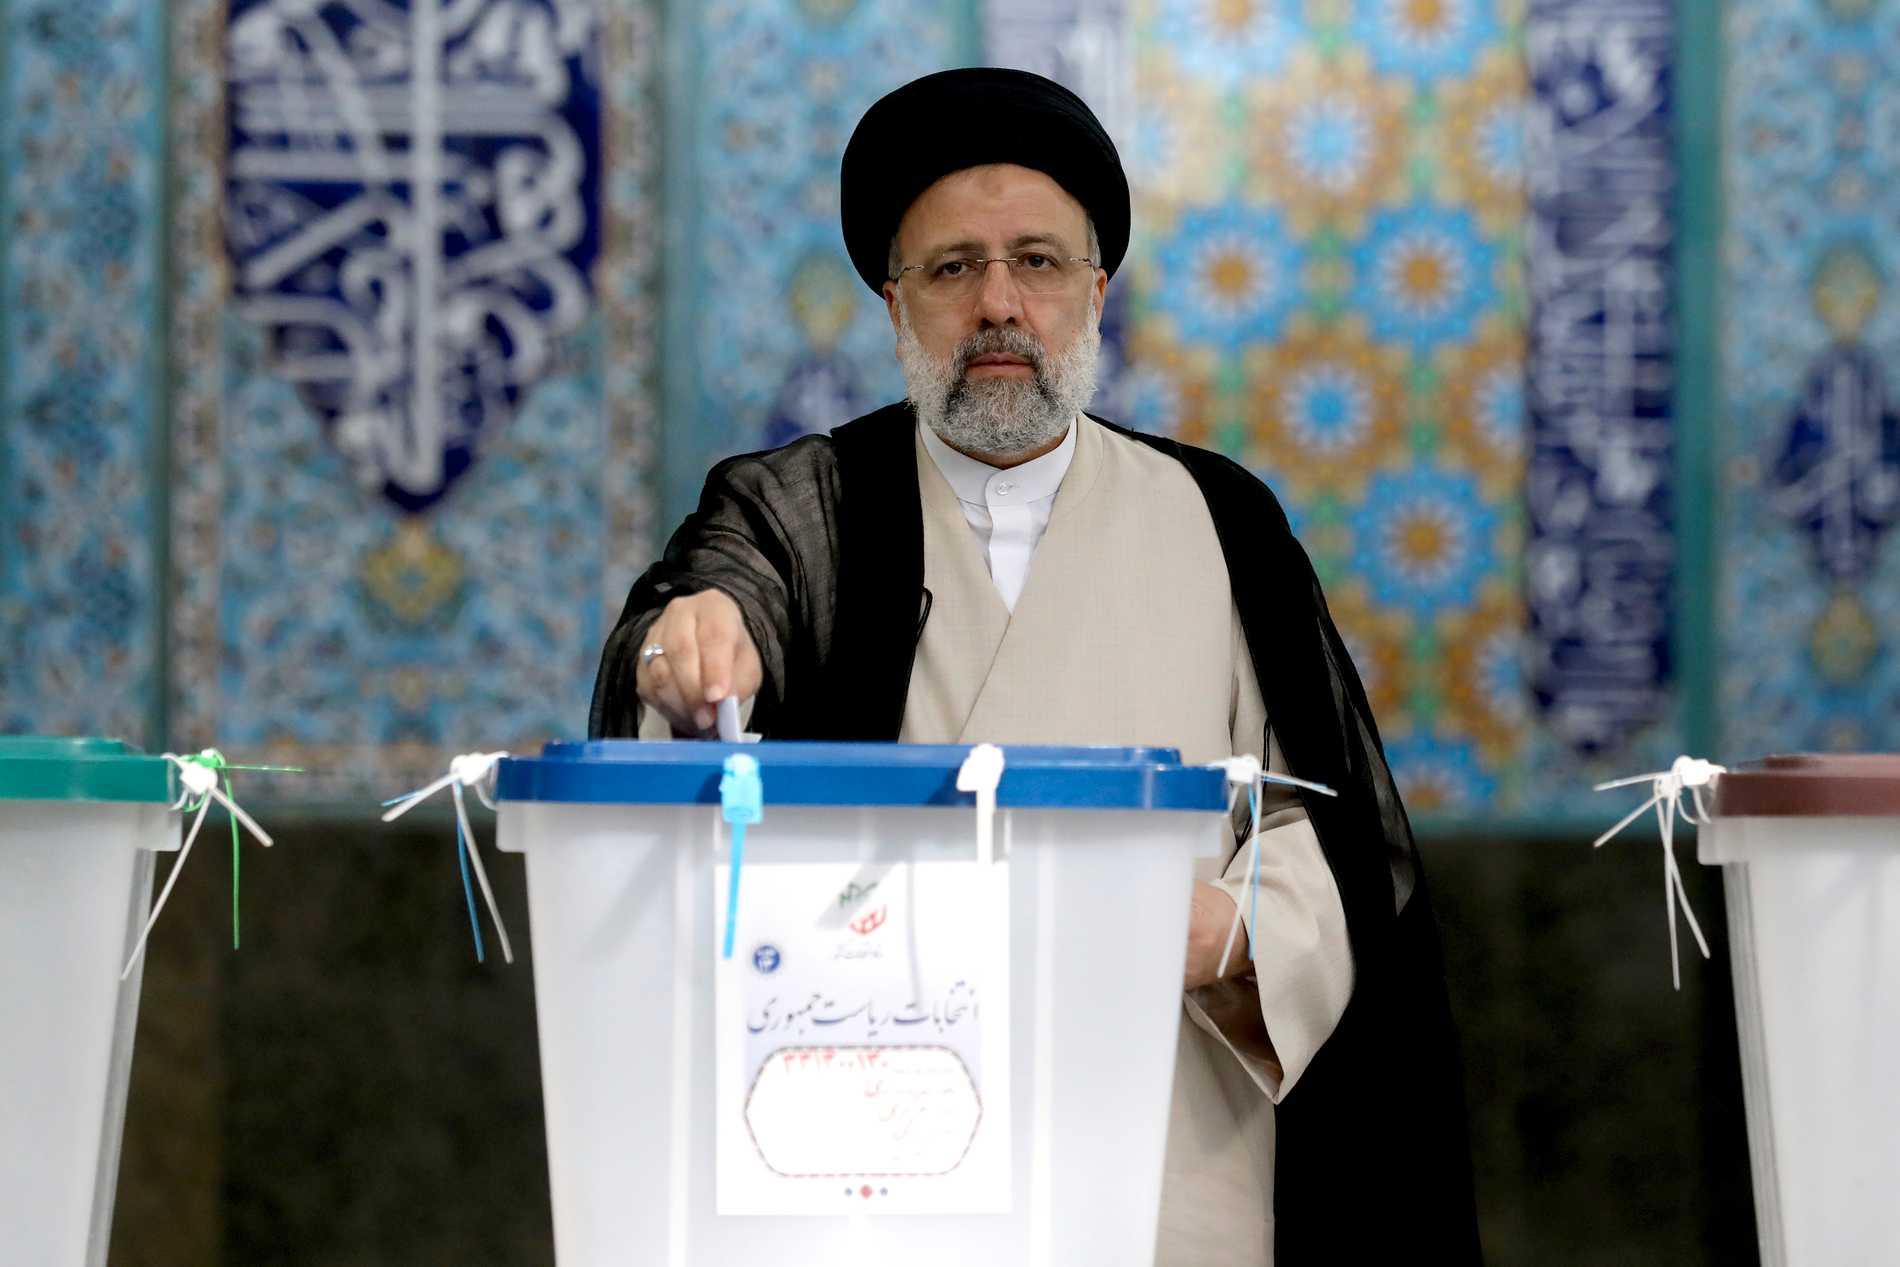 Presidentkandidaten Ebrahim Raisi.